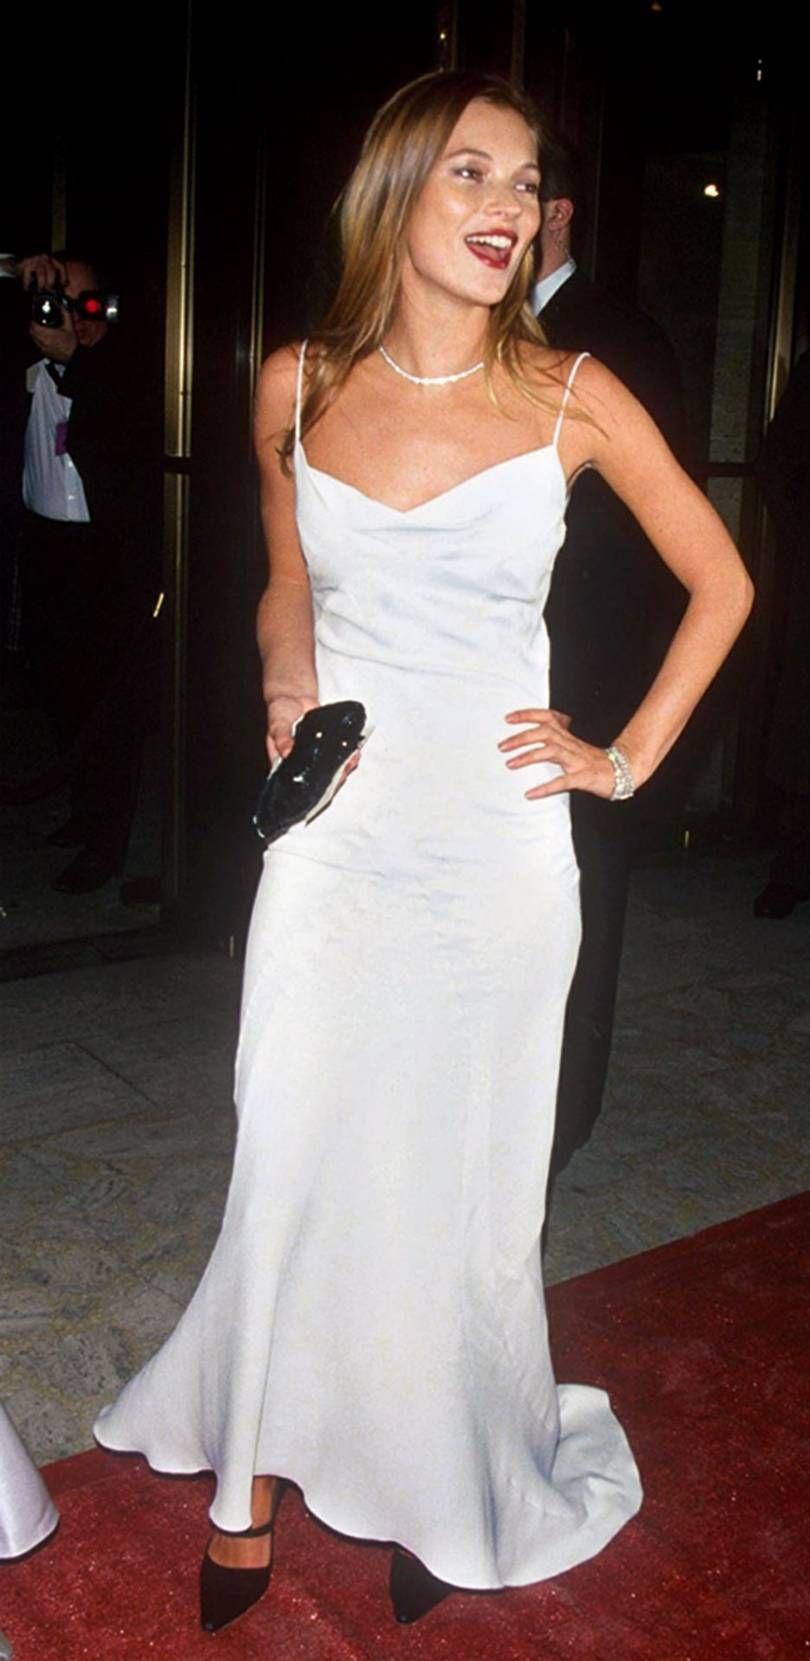 Kate Moss 90s John Galliano White Slip Dress Dresses Slip Dress 90s Kate Moss Style